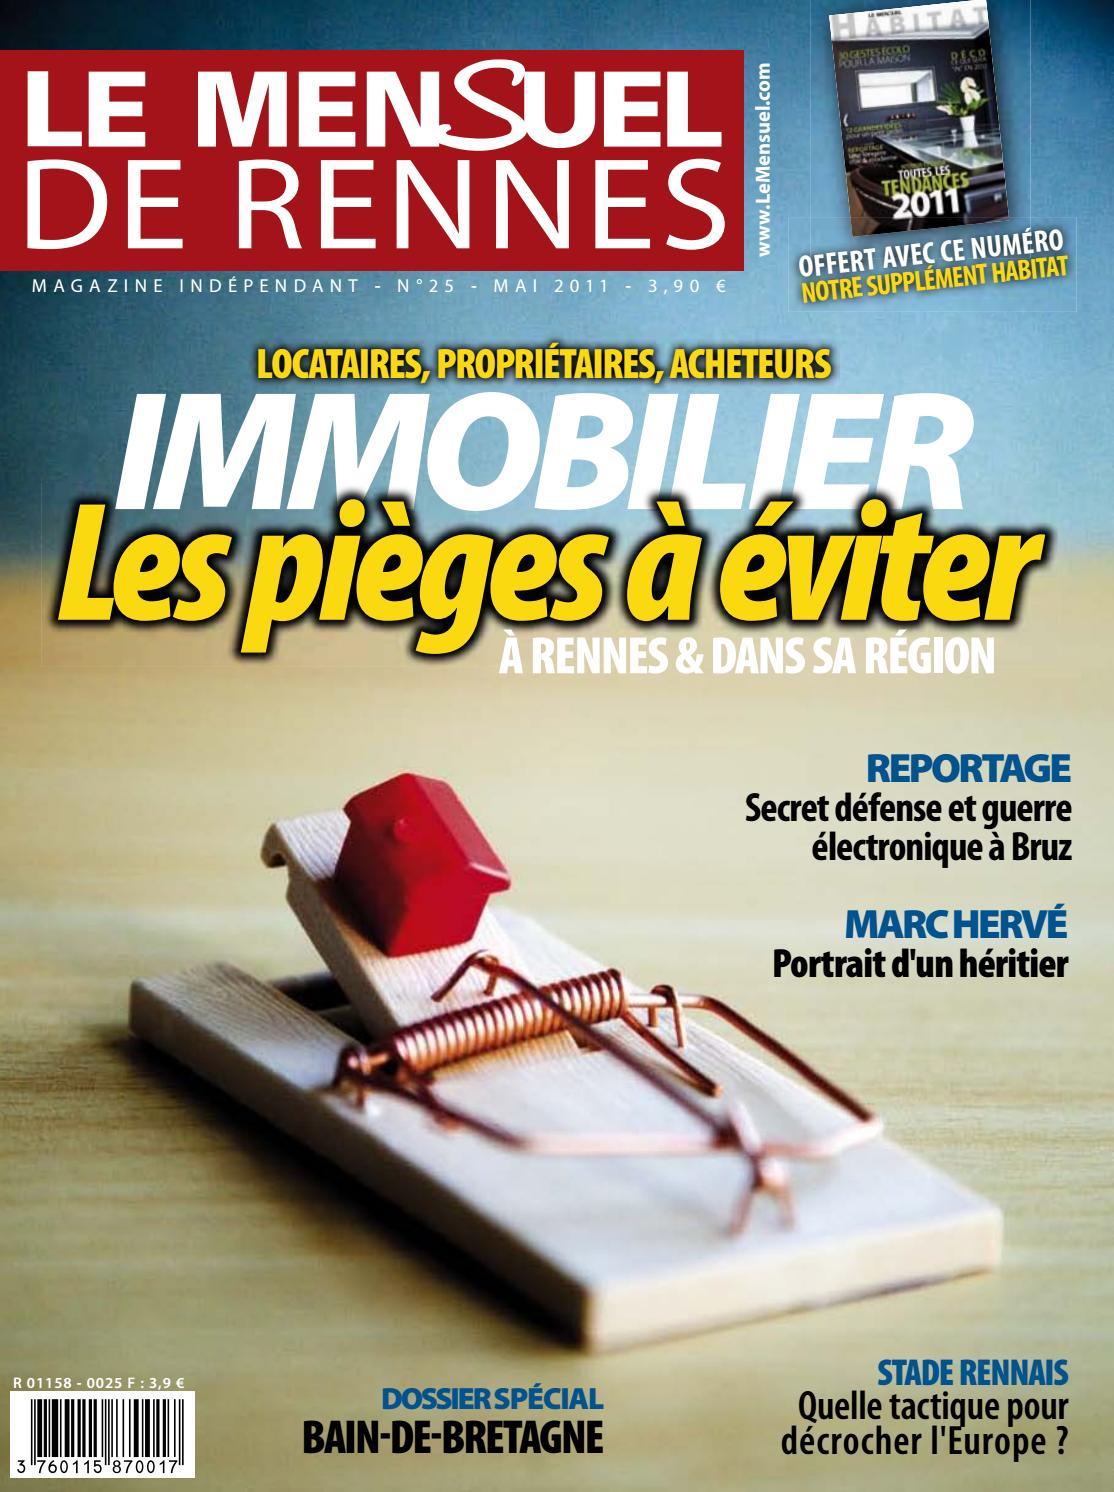 le mensuel de rennes (36) by mensuel de rennes - issuu